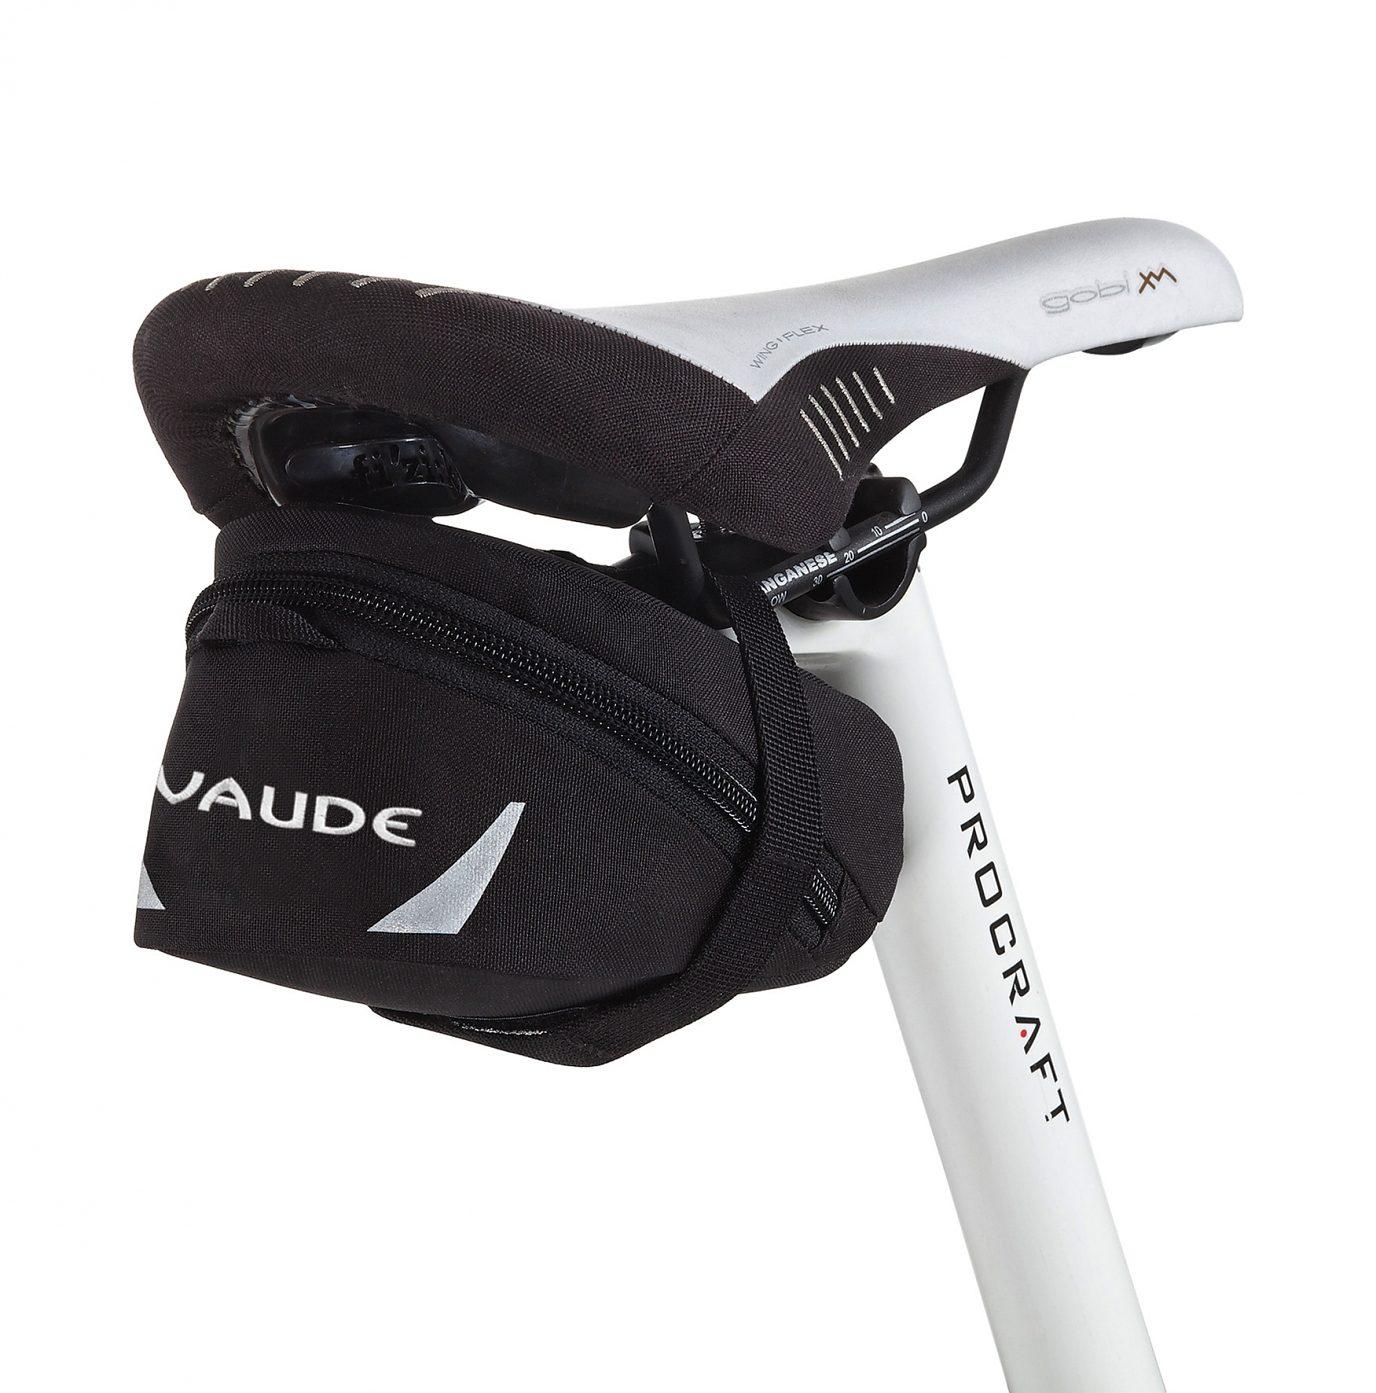 VAUDE Fahrradtasche »VAUDE Tube Bag M Saddlebag«